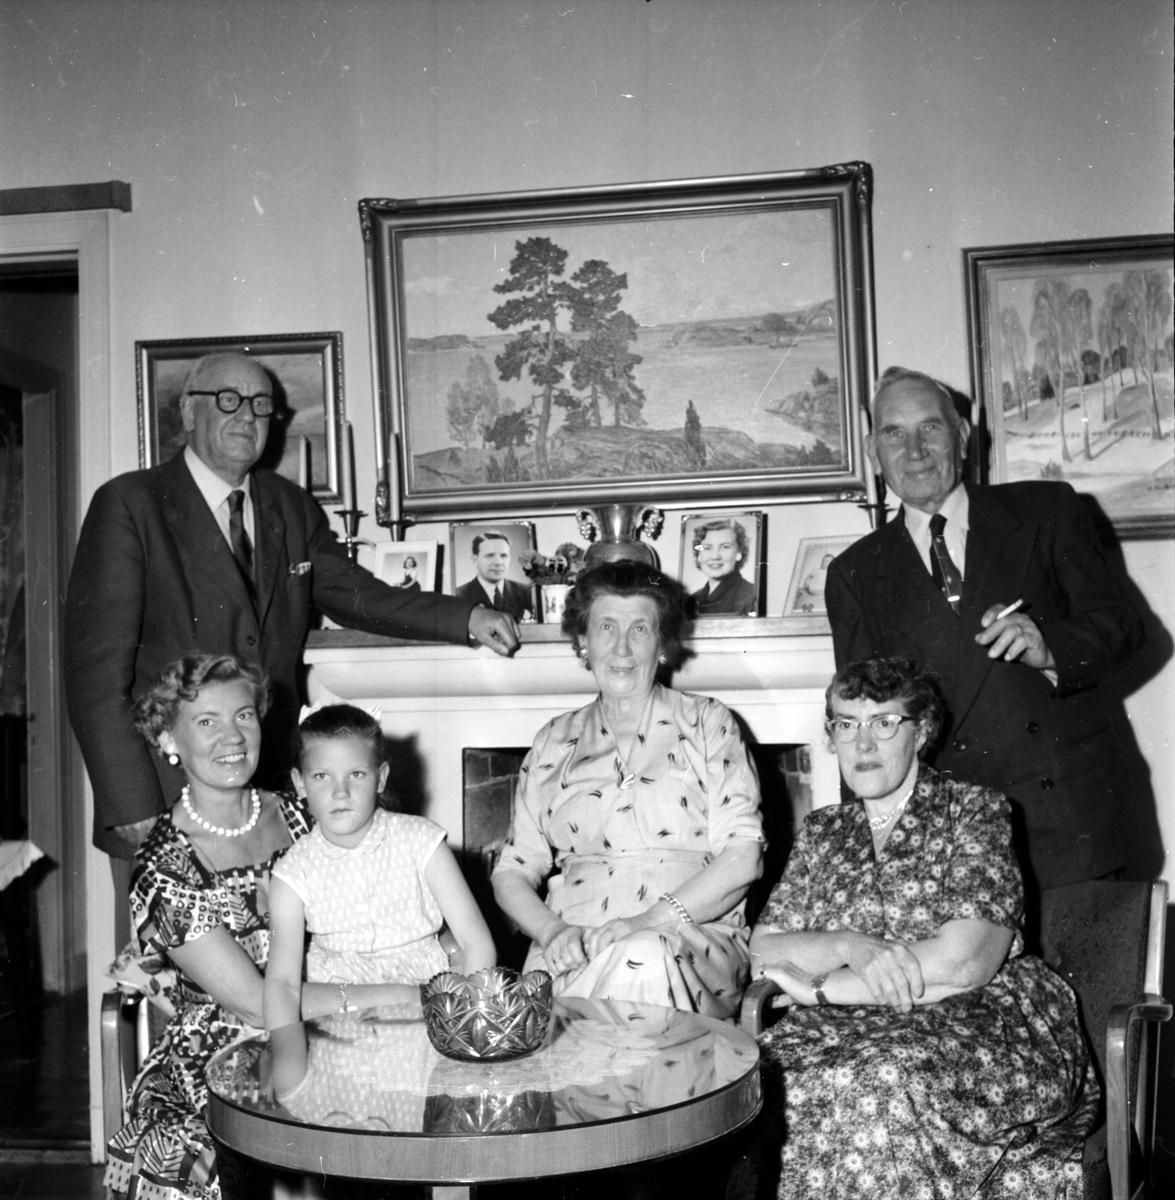 Berge Robert, Guldgrävare fr USA, 9 Juli 1957